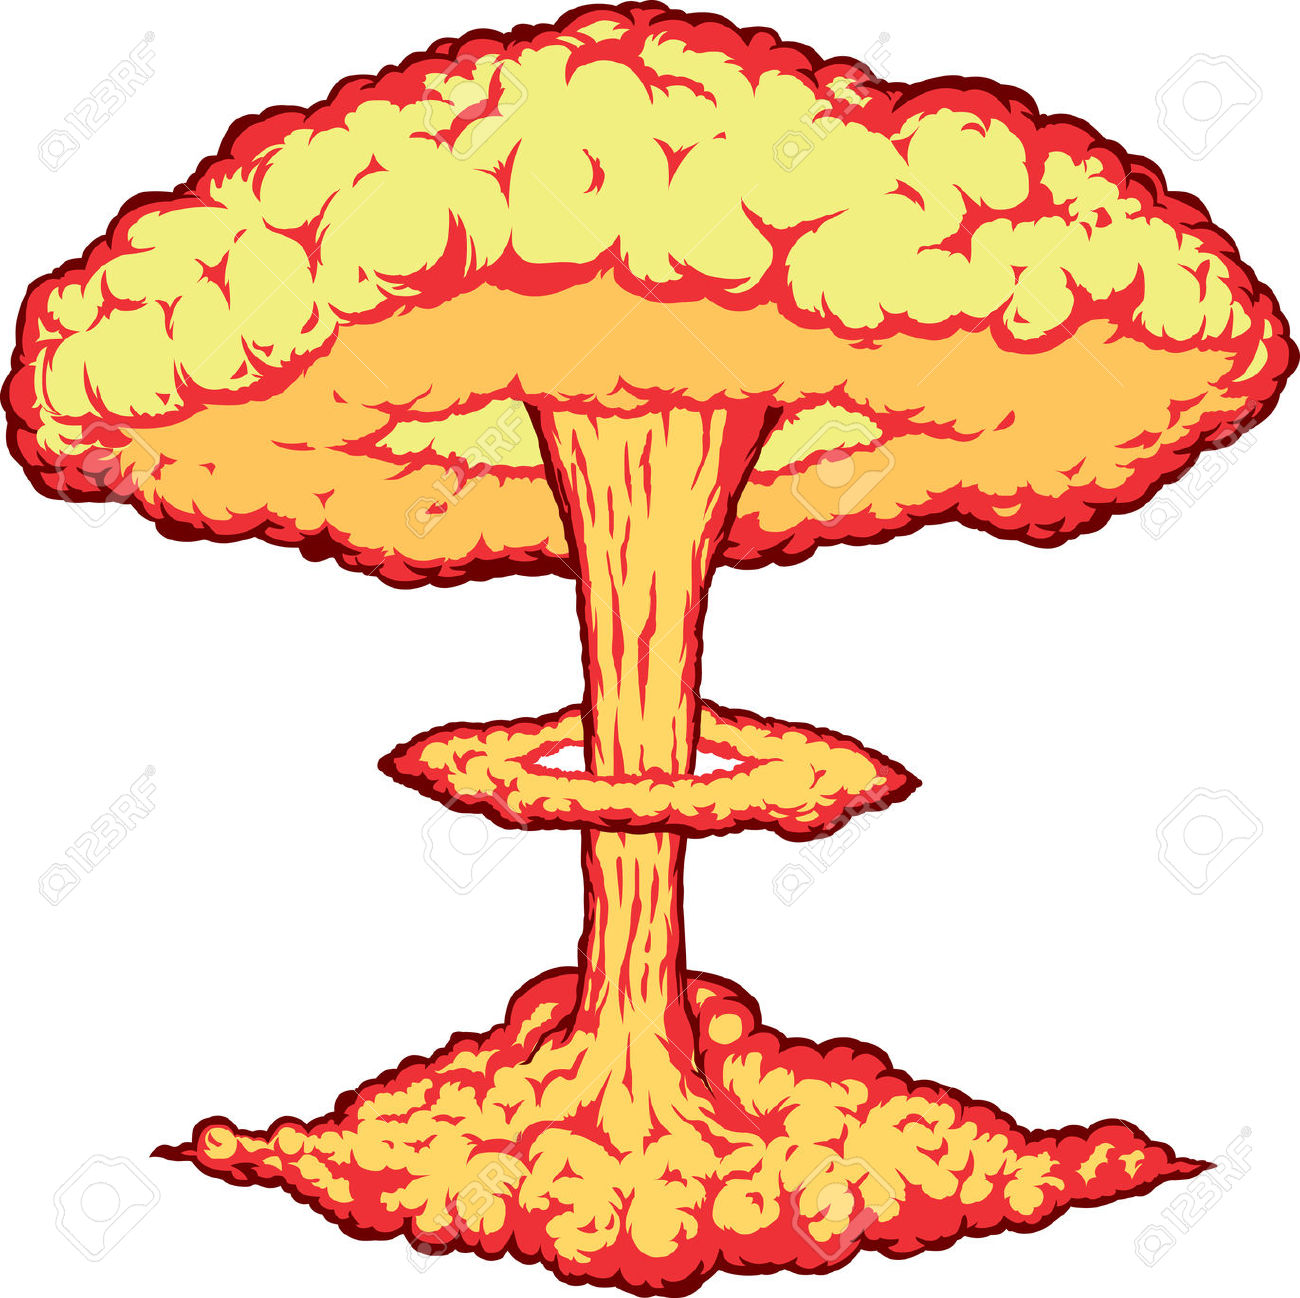 Nuclear explosion clipart